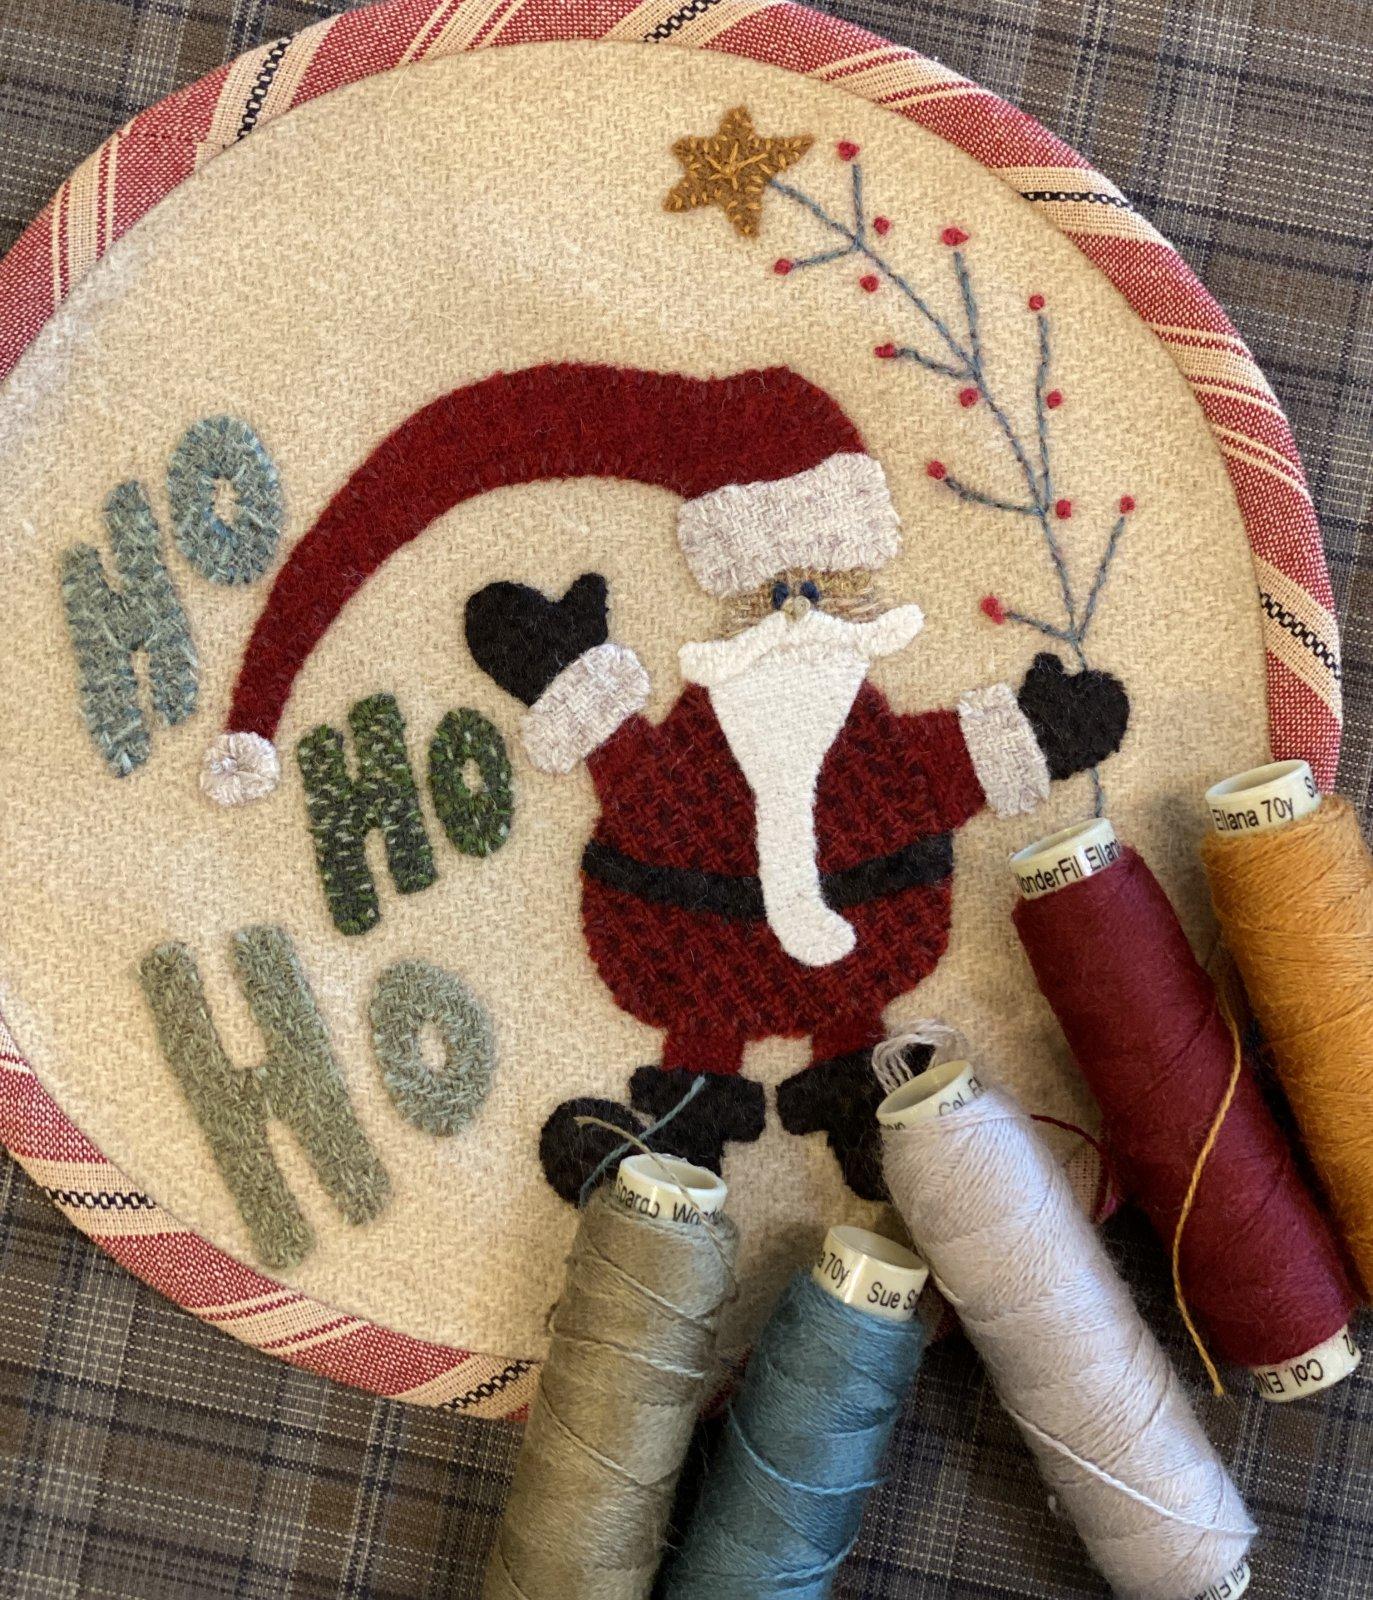 HO HO HO kit with pattern